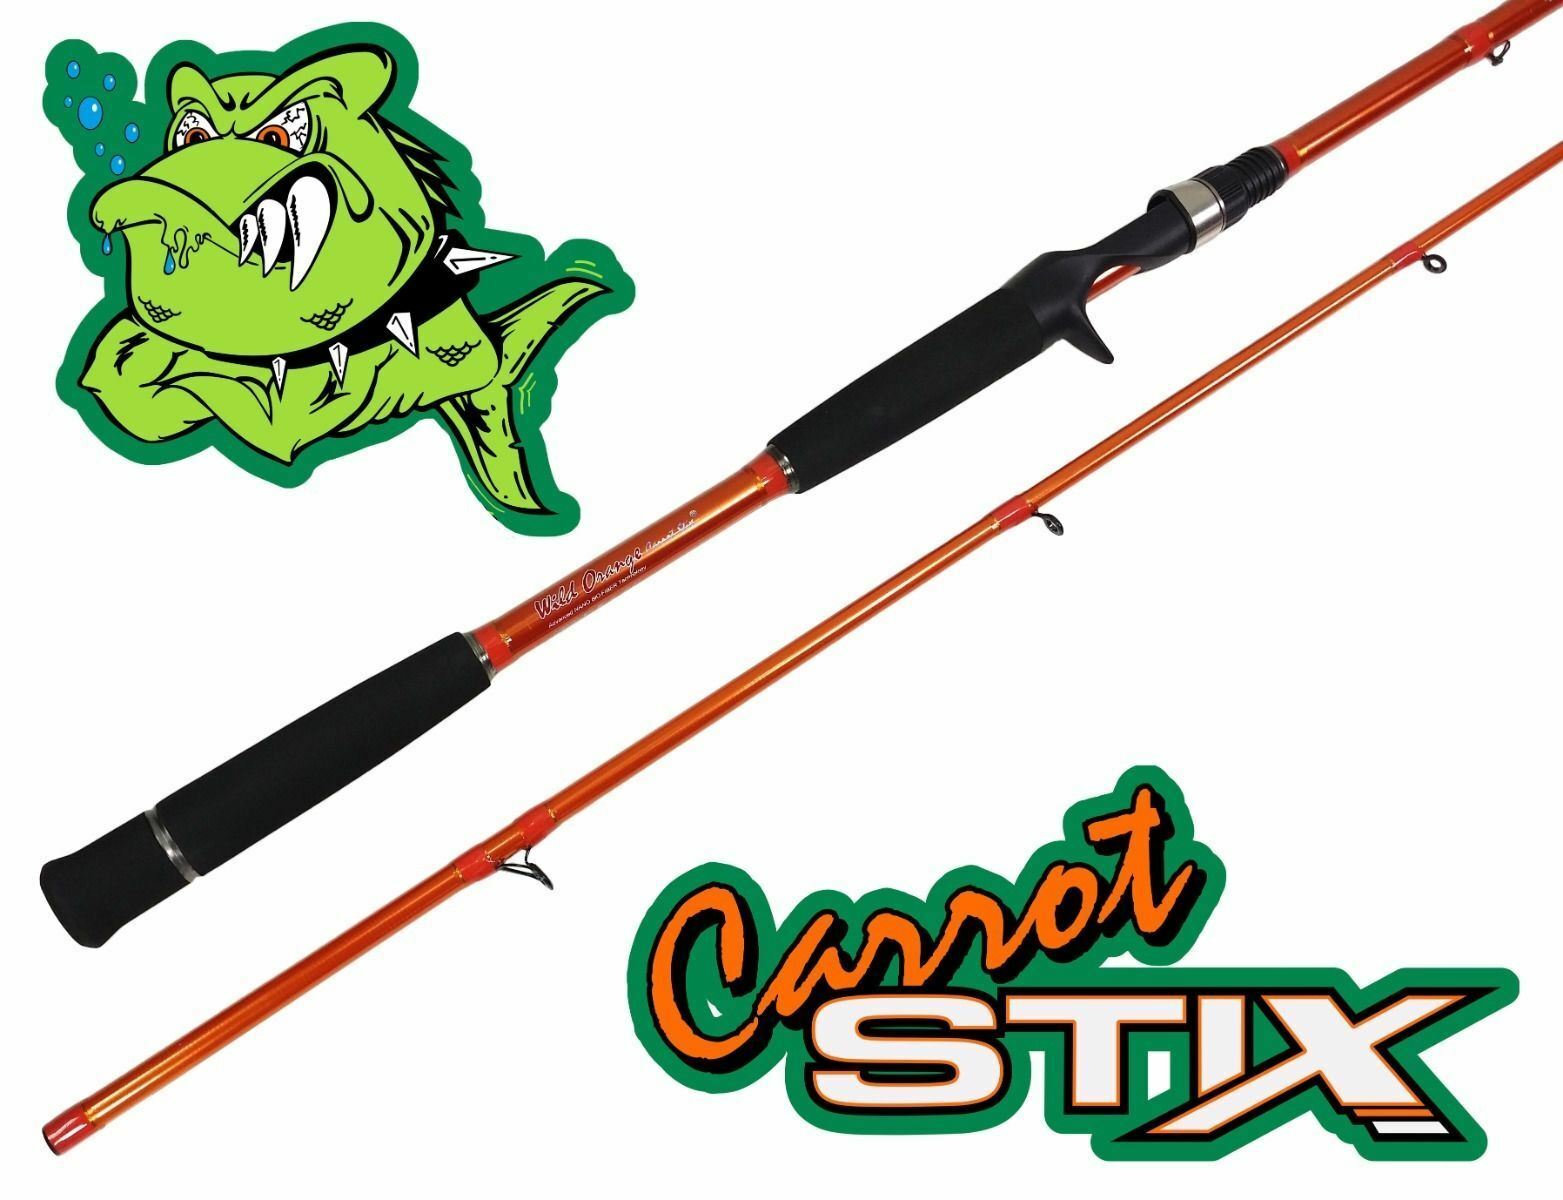 Carred Stix CASTING  10' MEDIUM HEAVY WILD orange Salmon Steelhead Fishing Rod  cheap and fashion